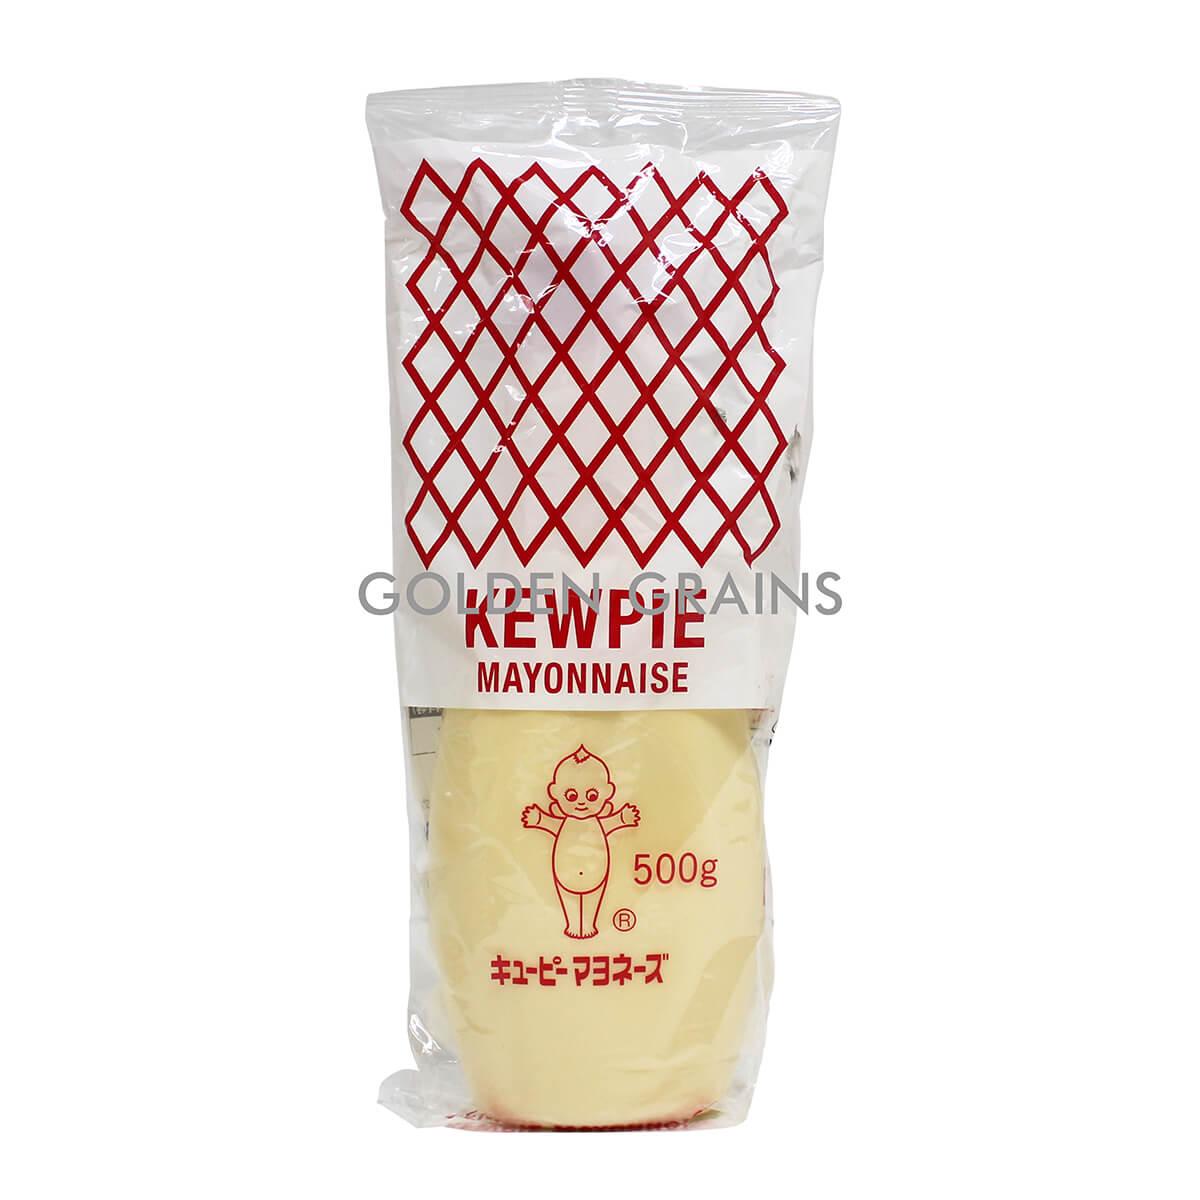 Golden Grains Dubai Export - Kewpie - Mayonnaise - Front.jpg